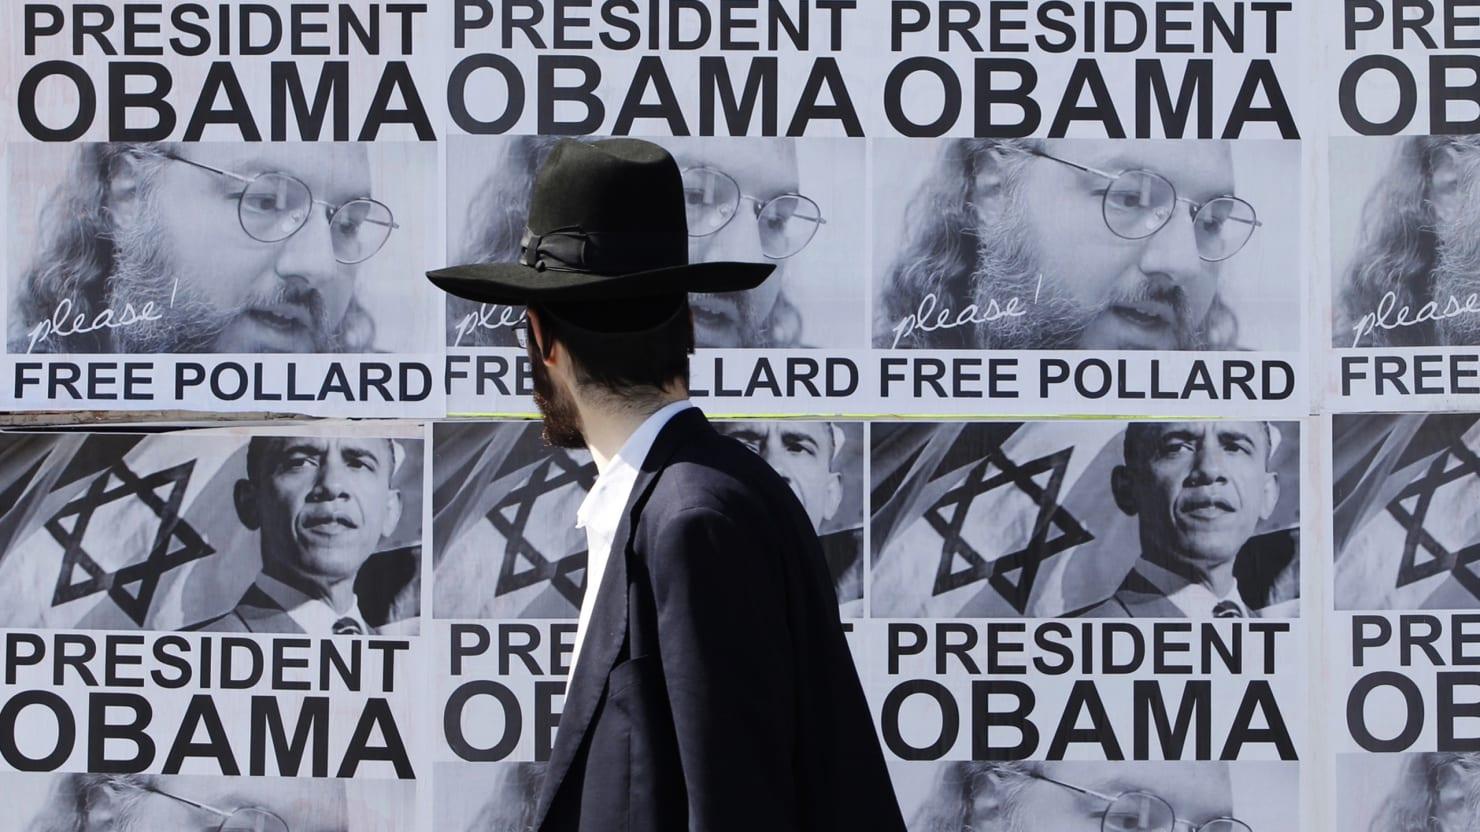 Obama Admin Confirms: We May Free Israeli Spy to Save Peace Talks